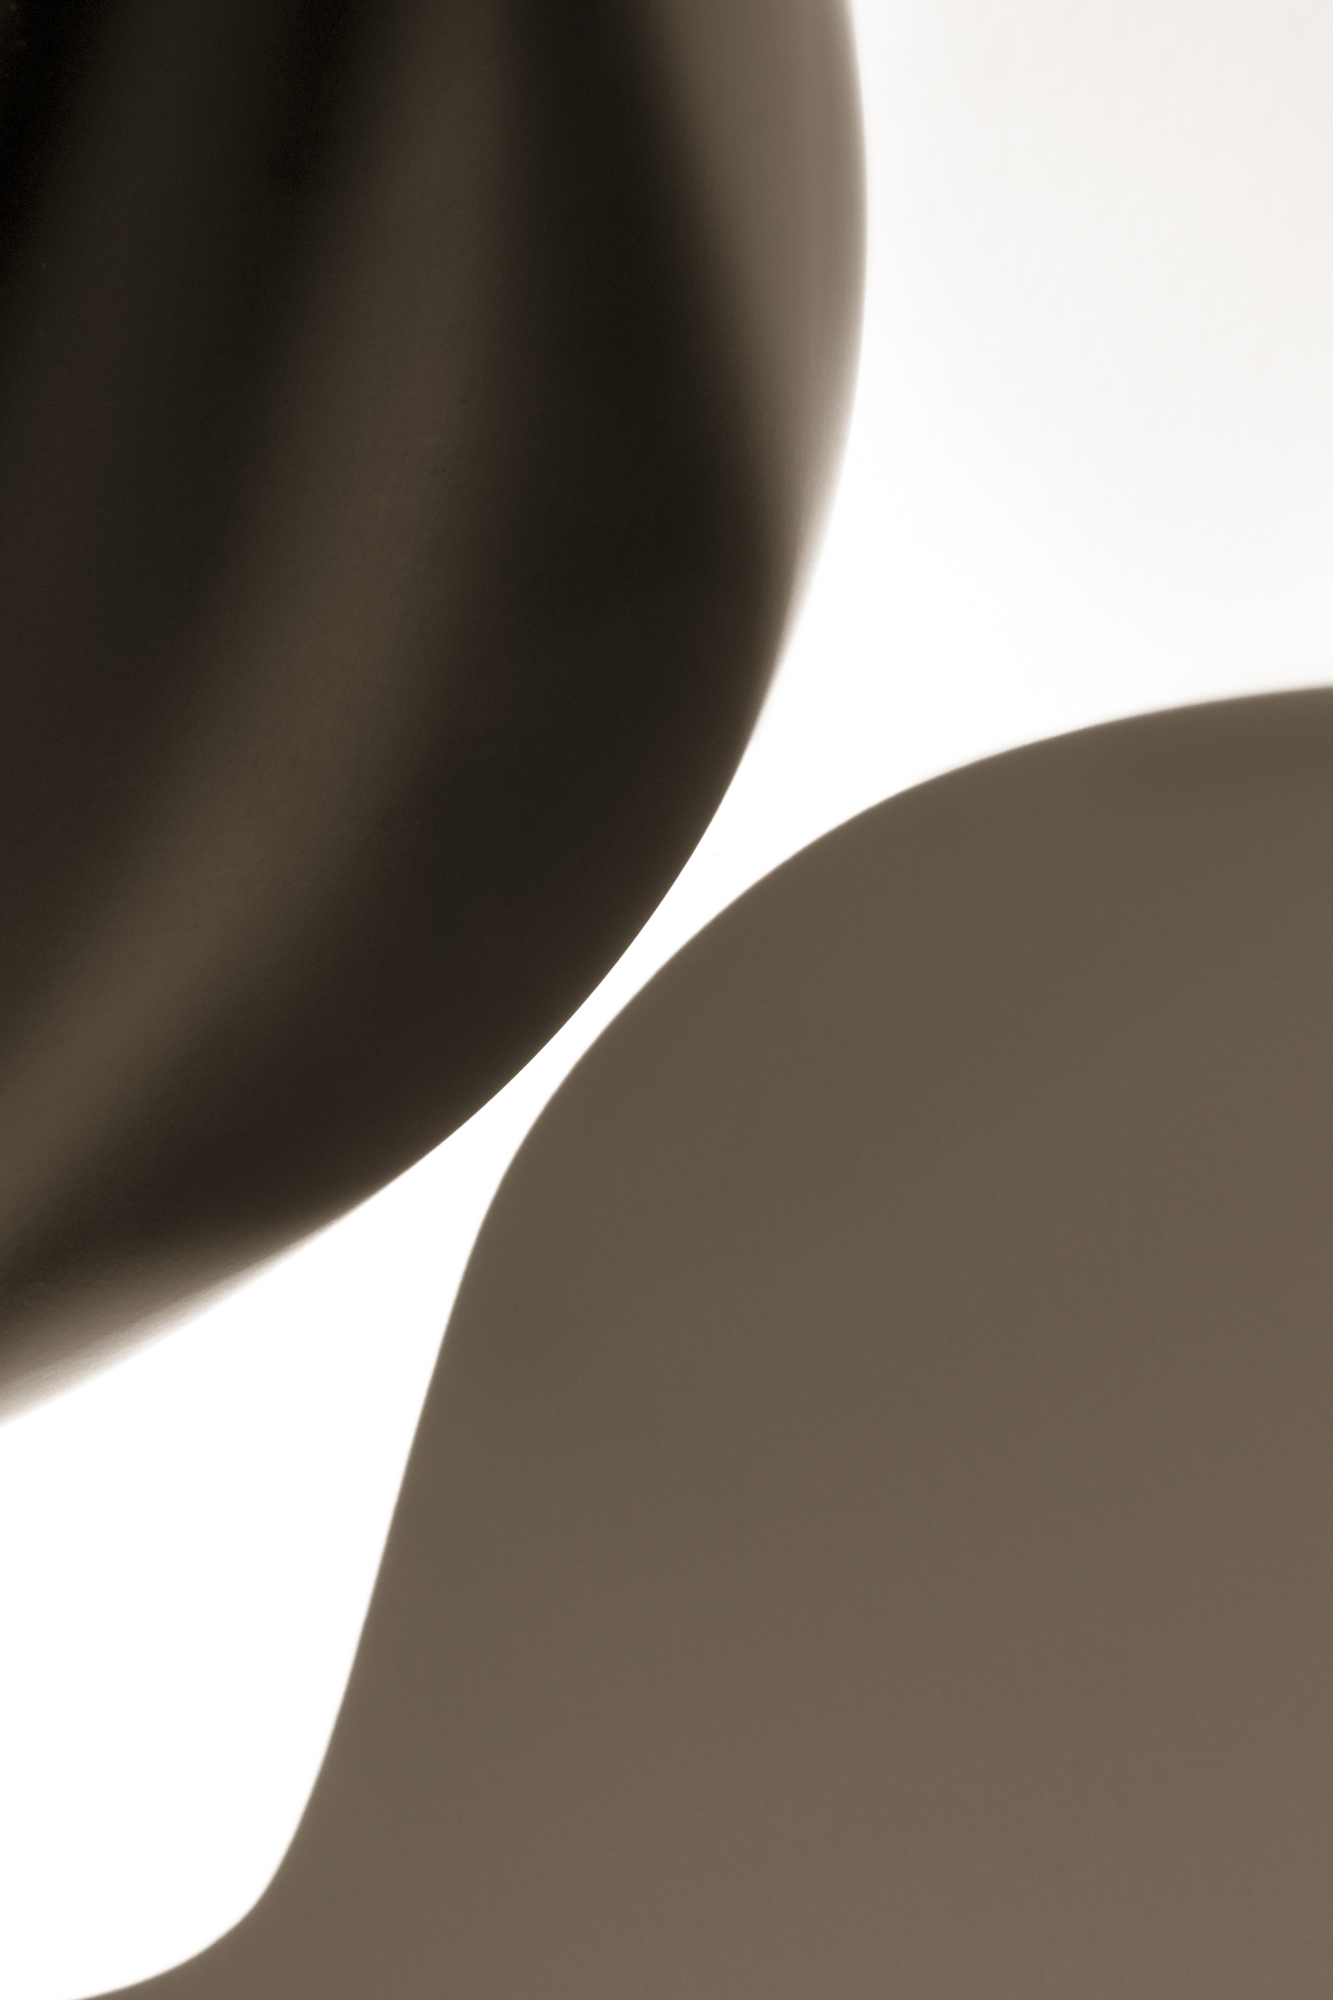 Form + Shadow VI